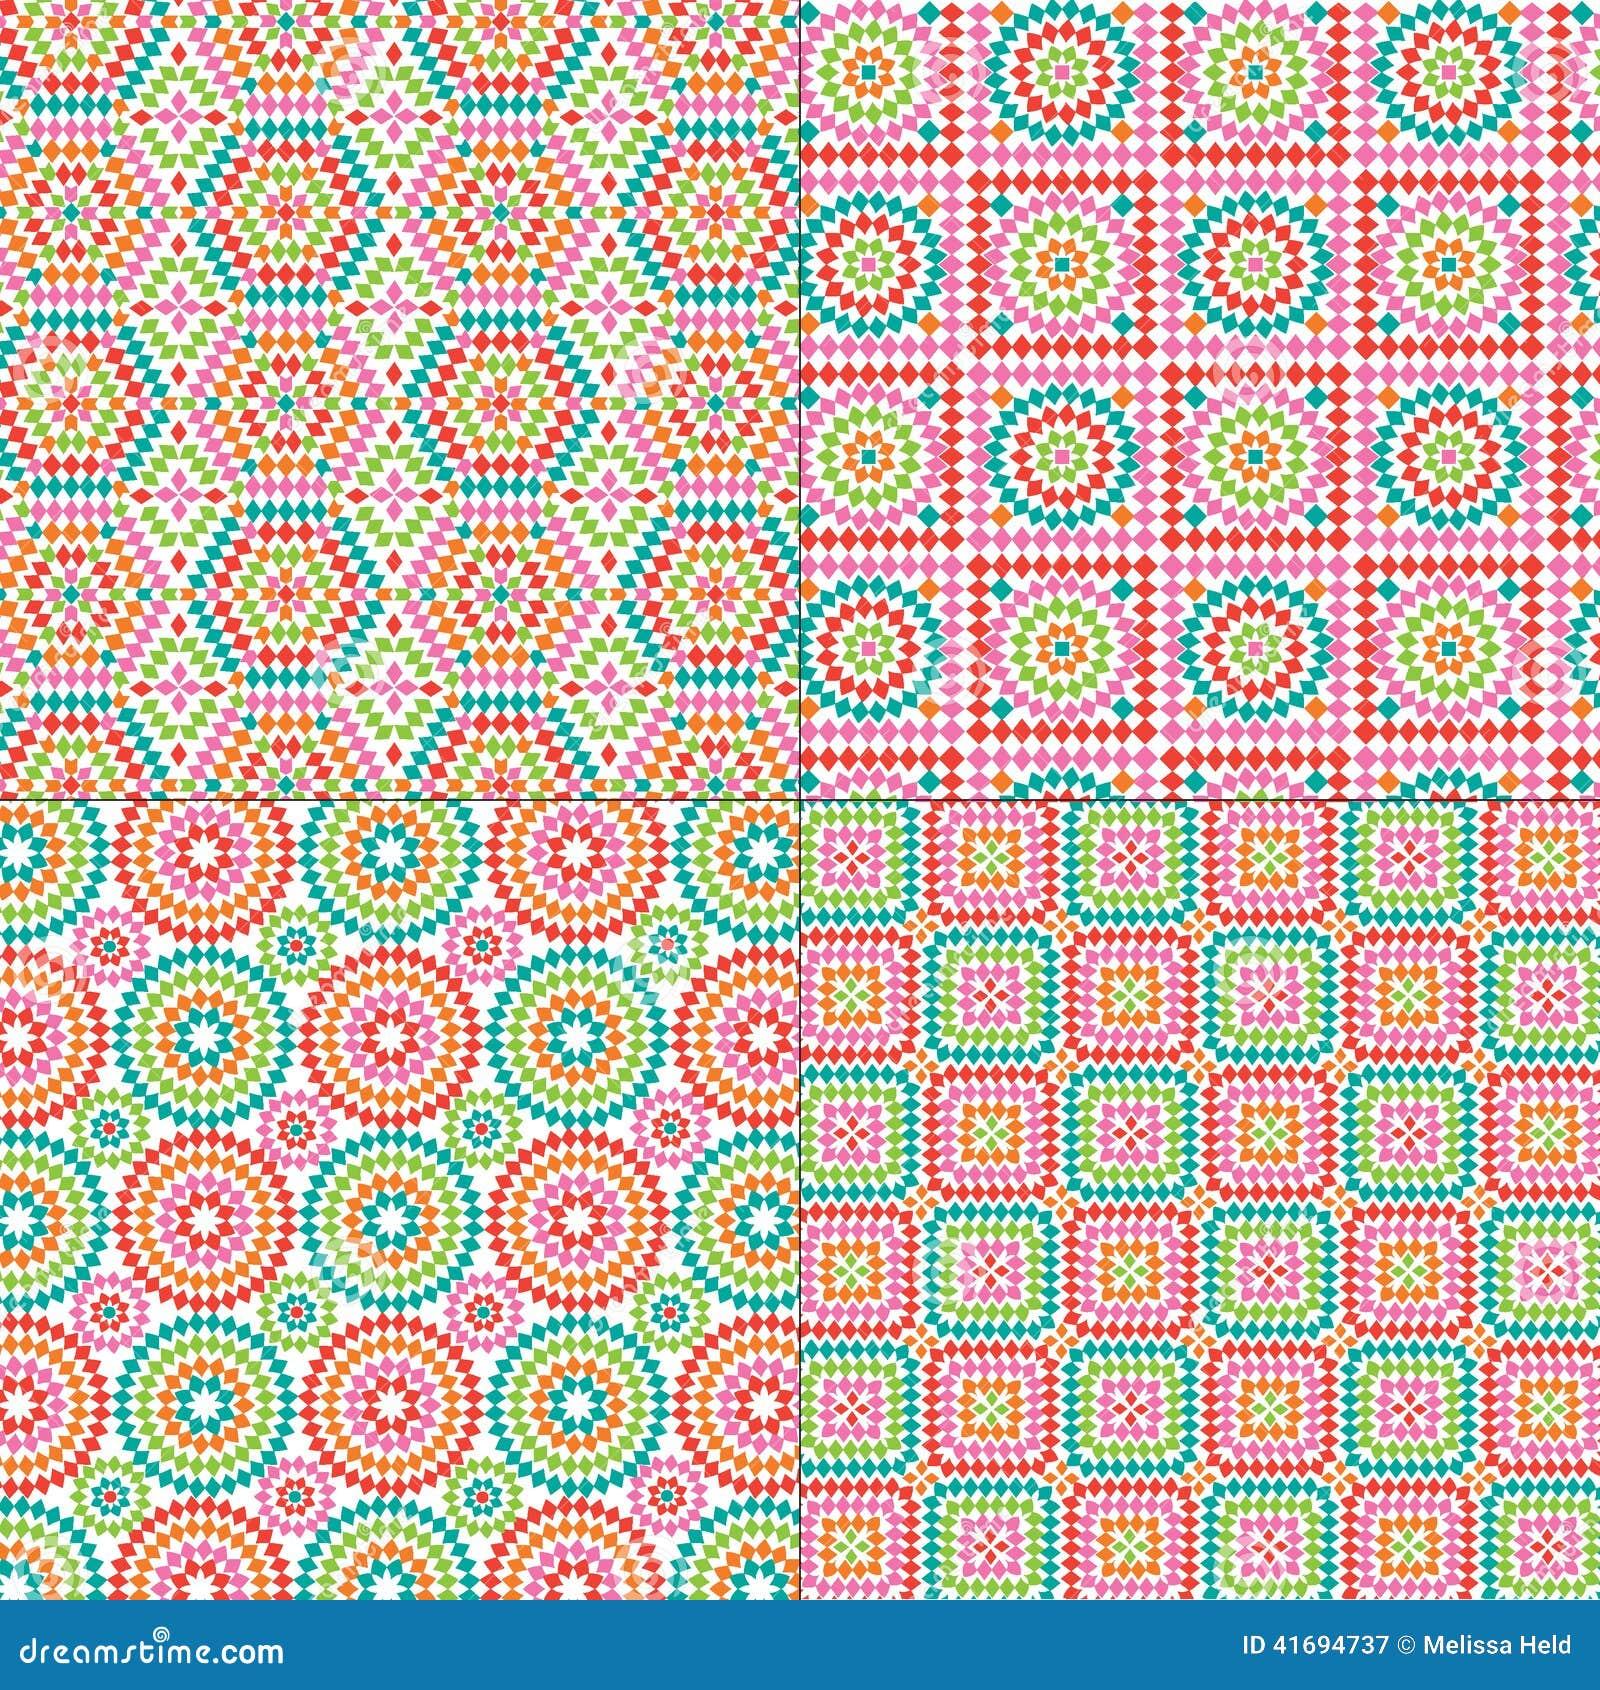 Oma-quadratische Muster vektor abbildung. Illustration von ...